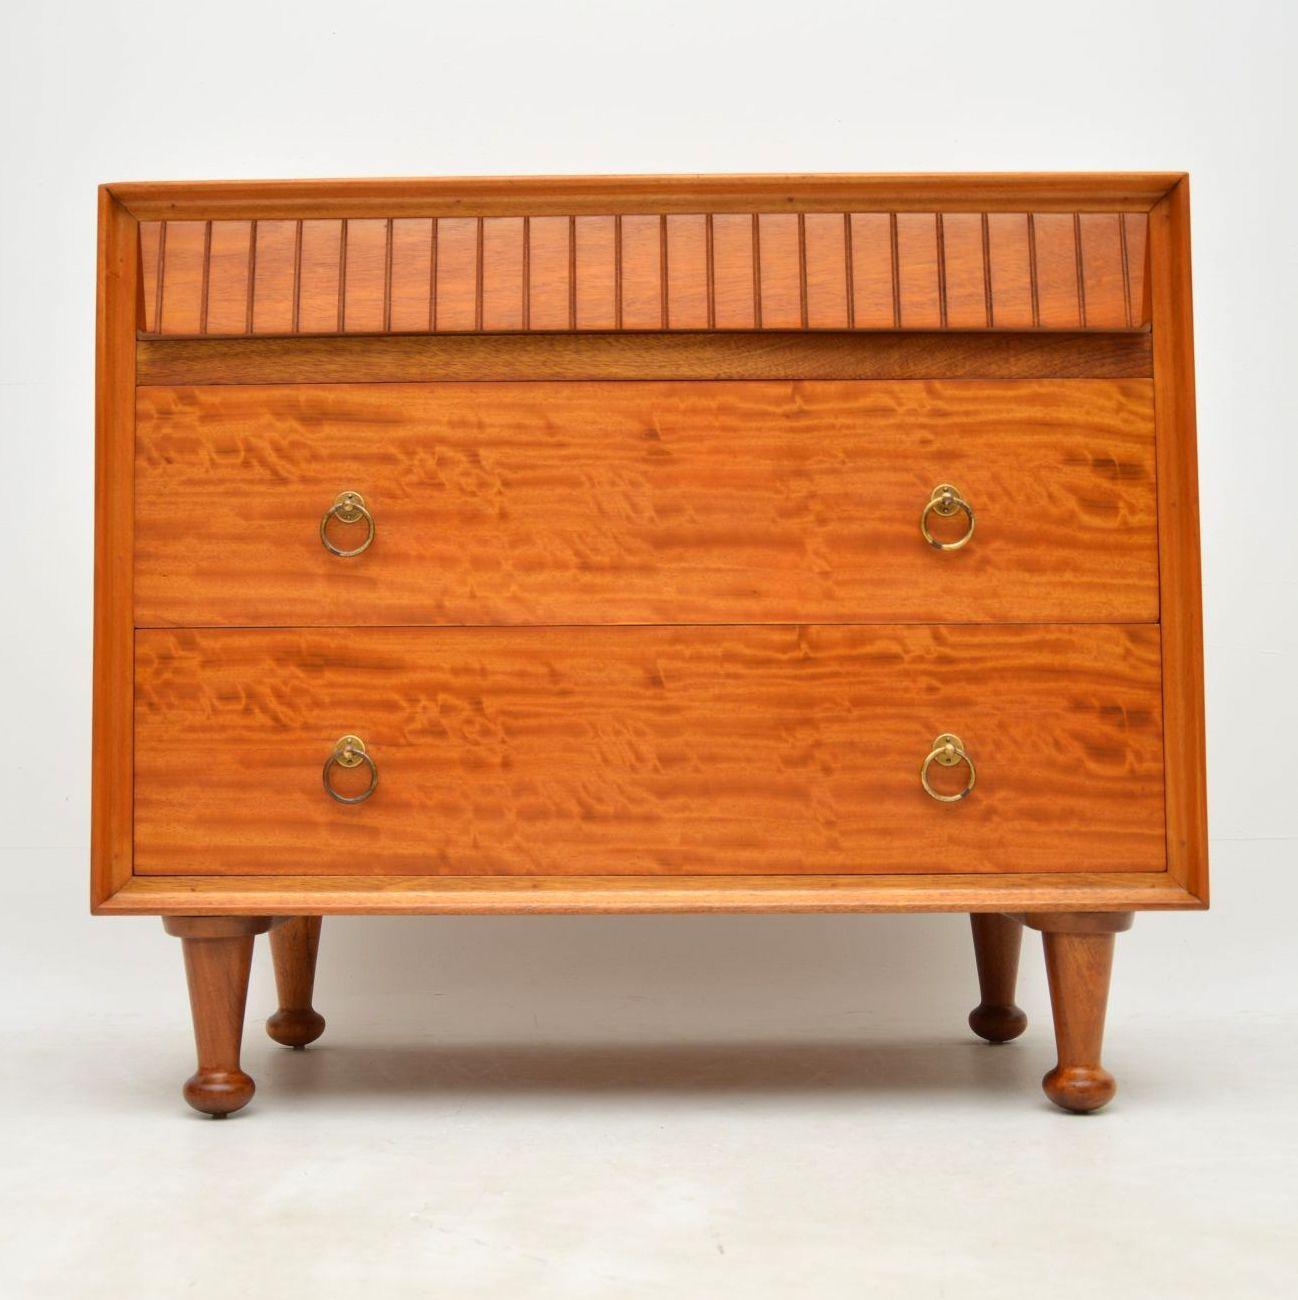 retro_vintage_satinwood_heals_chest_of_drawers_2